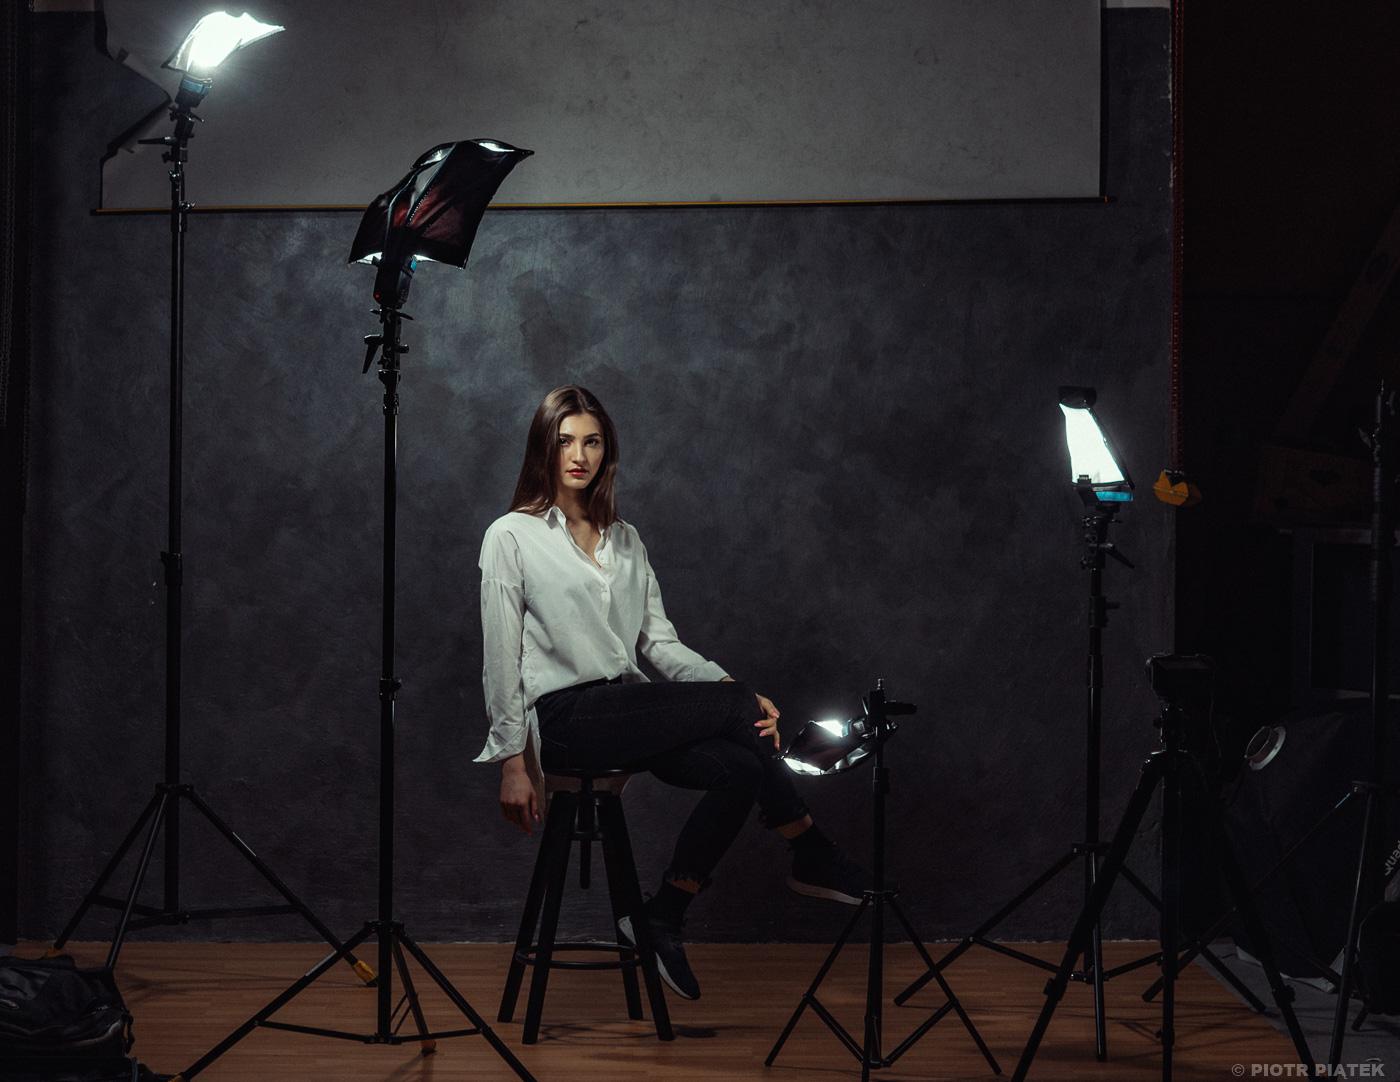 Strobist. Rogue: Flashbender 2 / model: Weronika Ocłoń, foto: Piotr Piątek